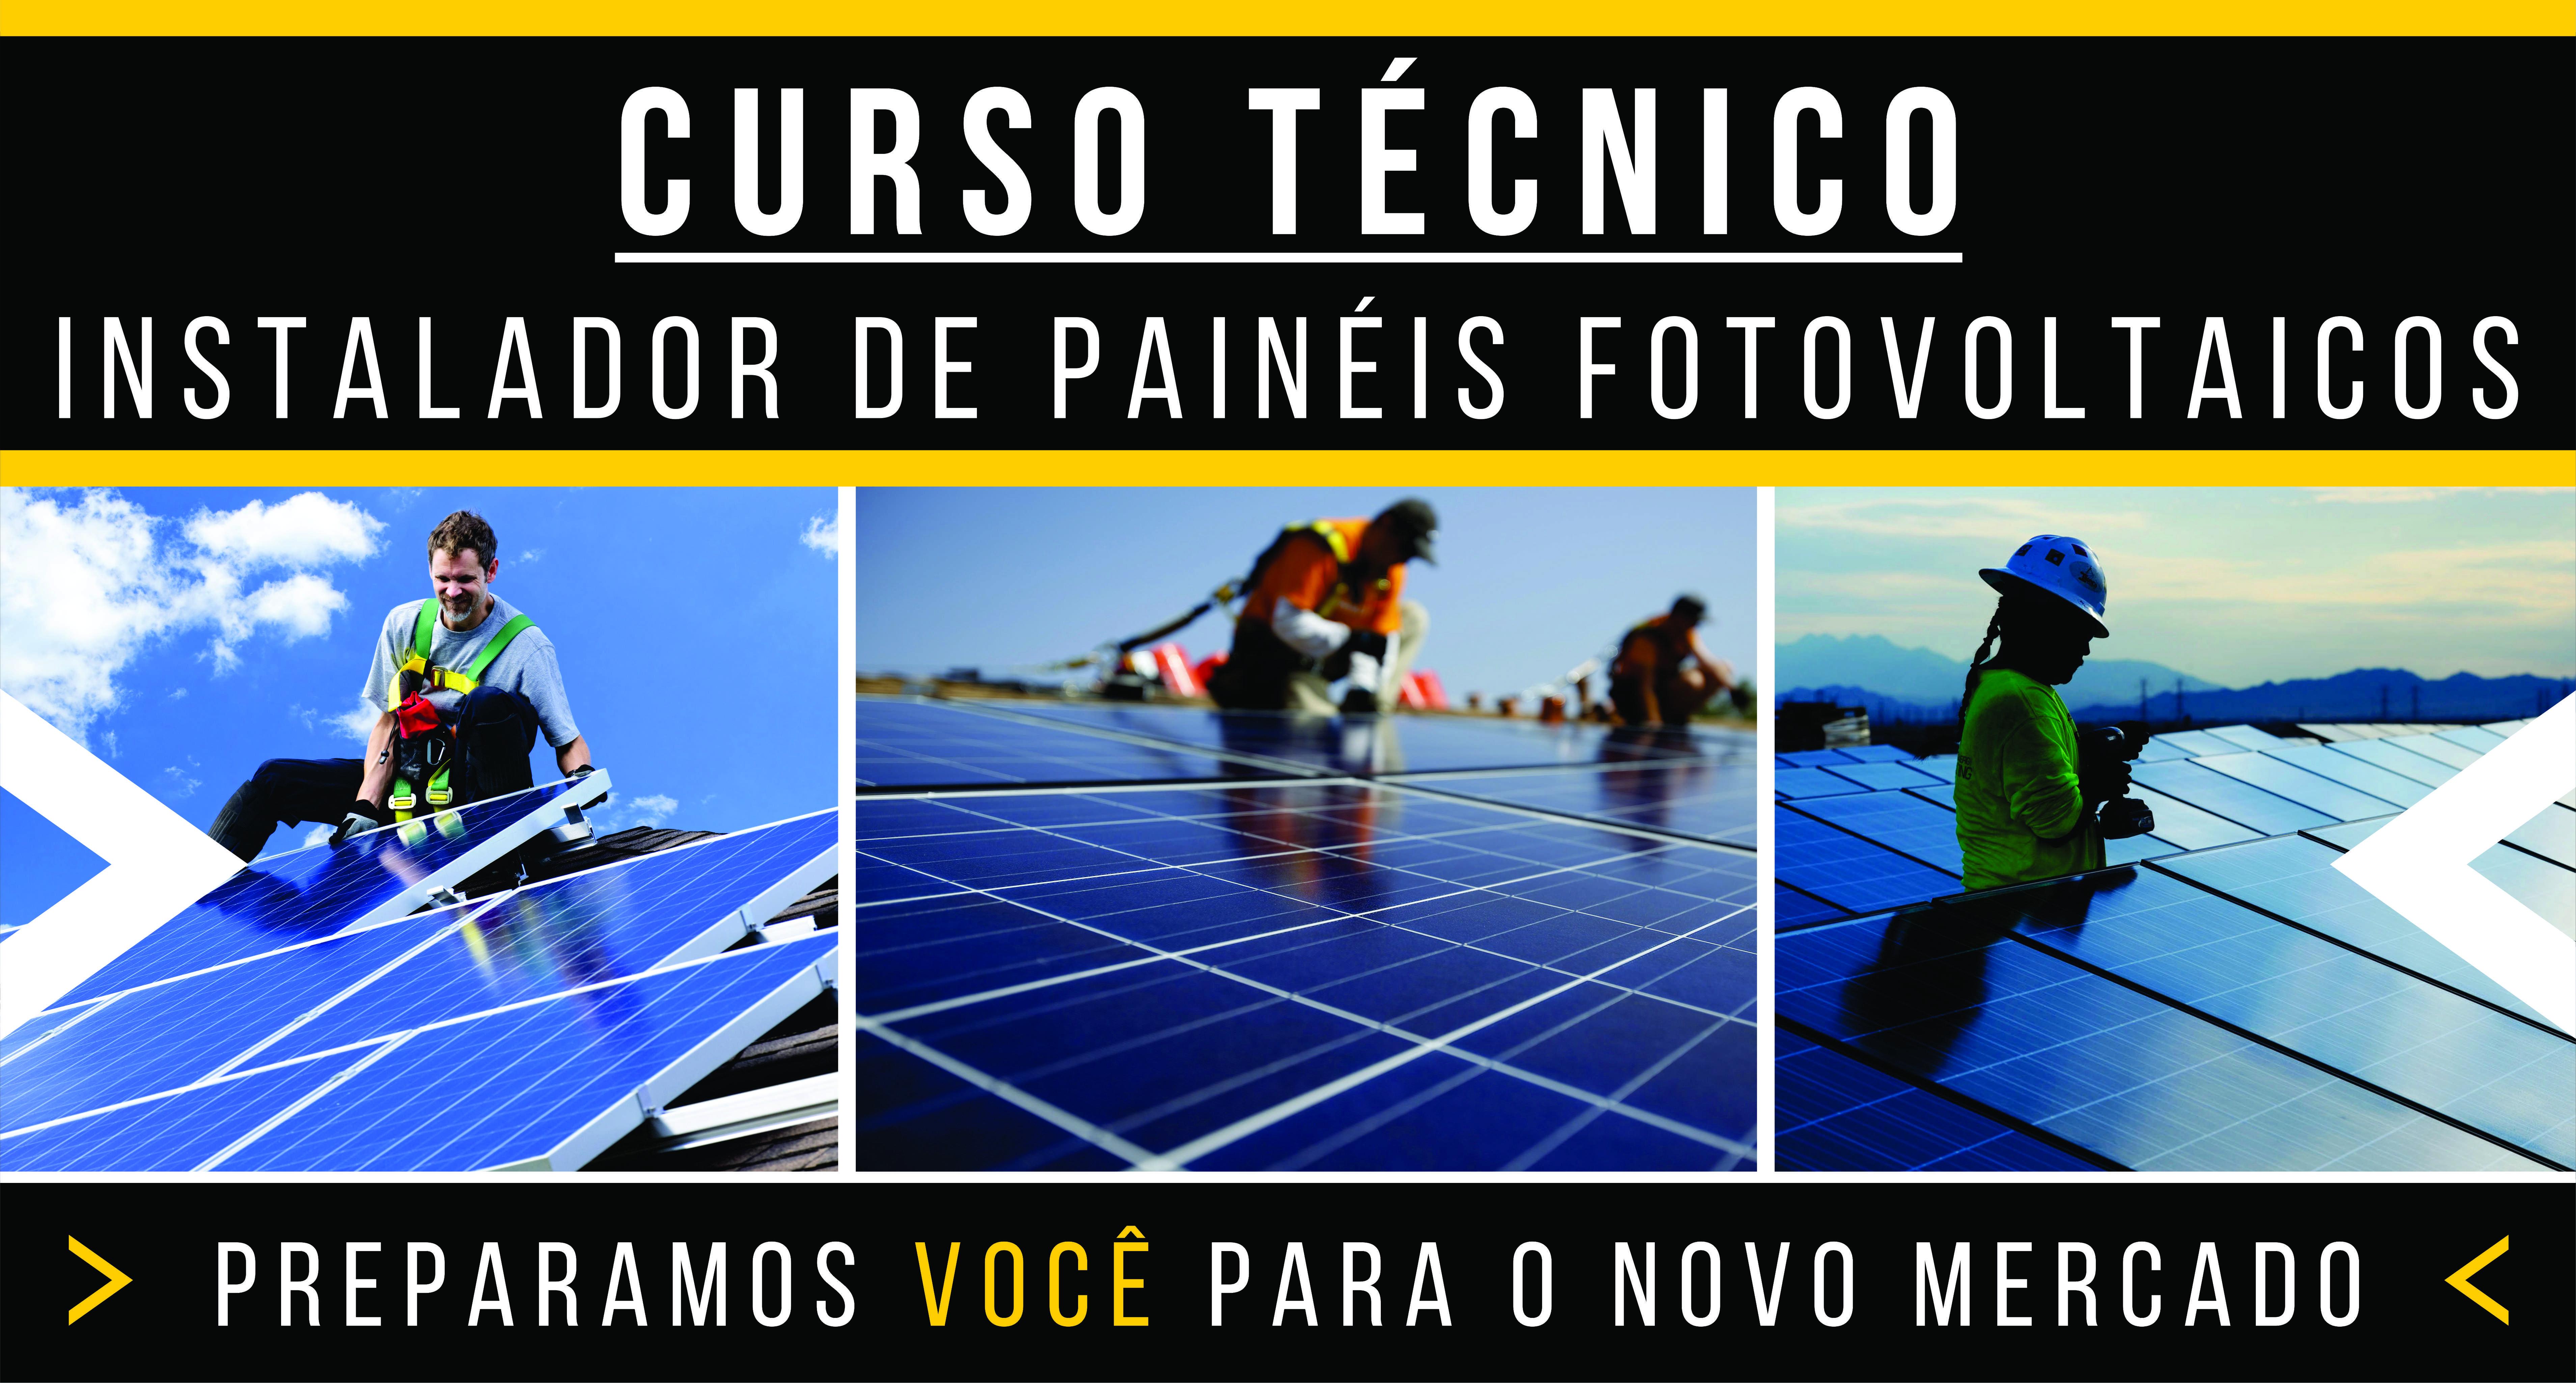 Curso de Energia Solar Fotovoltaica Porto Alegre 2018